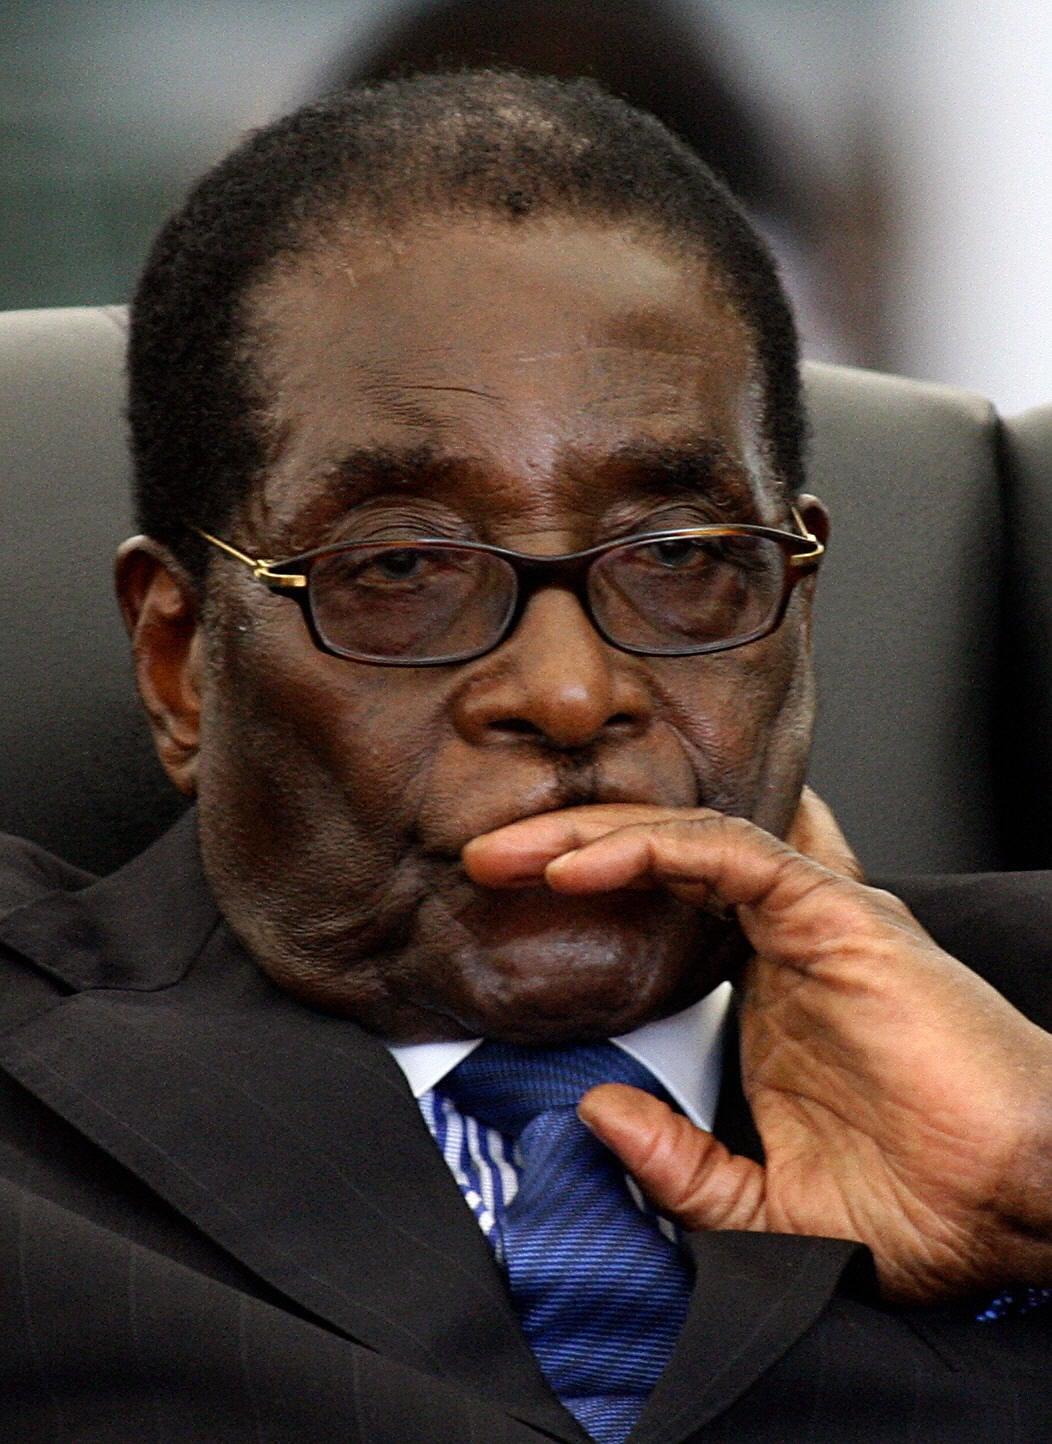 Zimbabwean President Robert Mugabe attends the swearing in ceremony of new Prime Minister Morgan Tsvangirai.